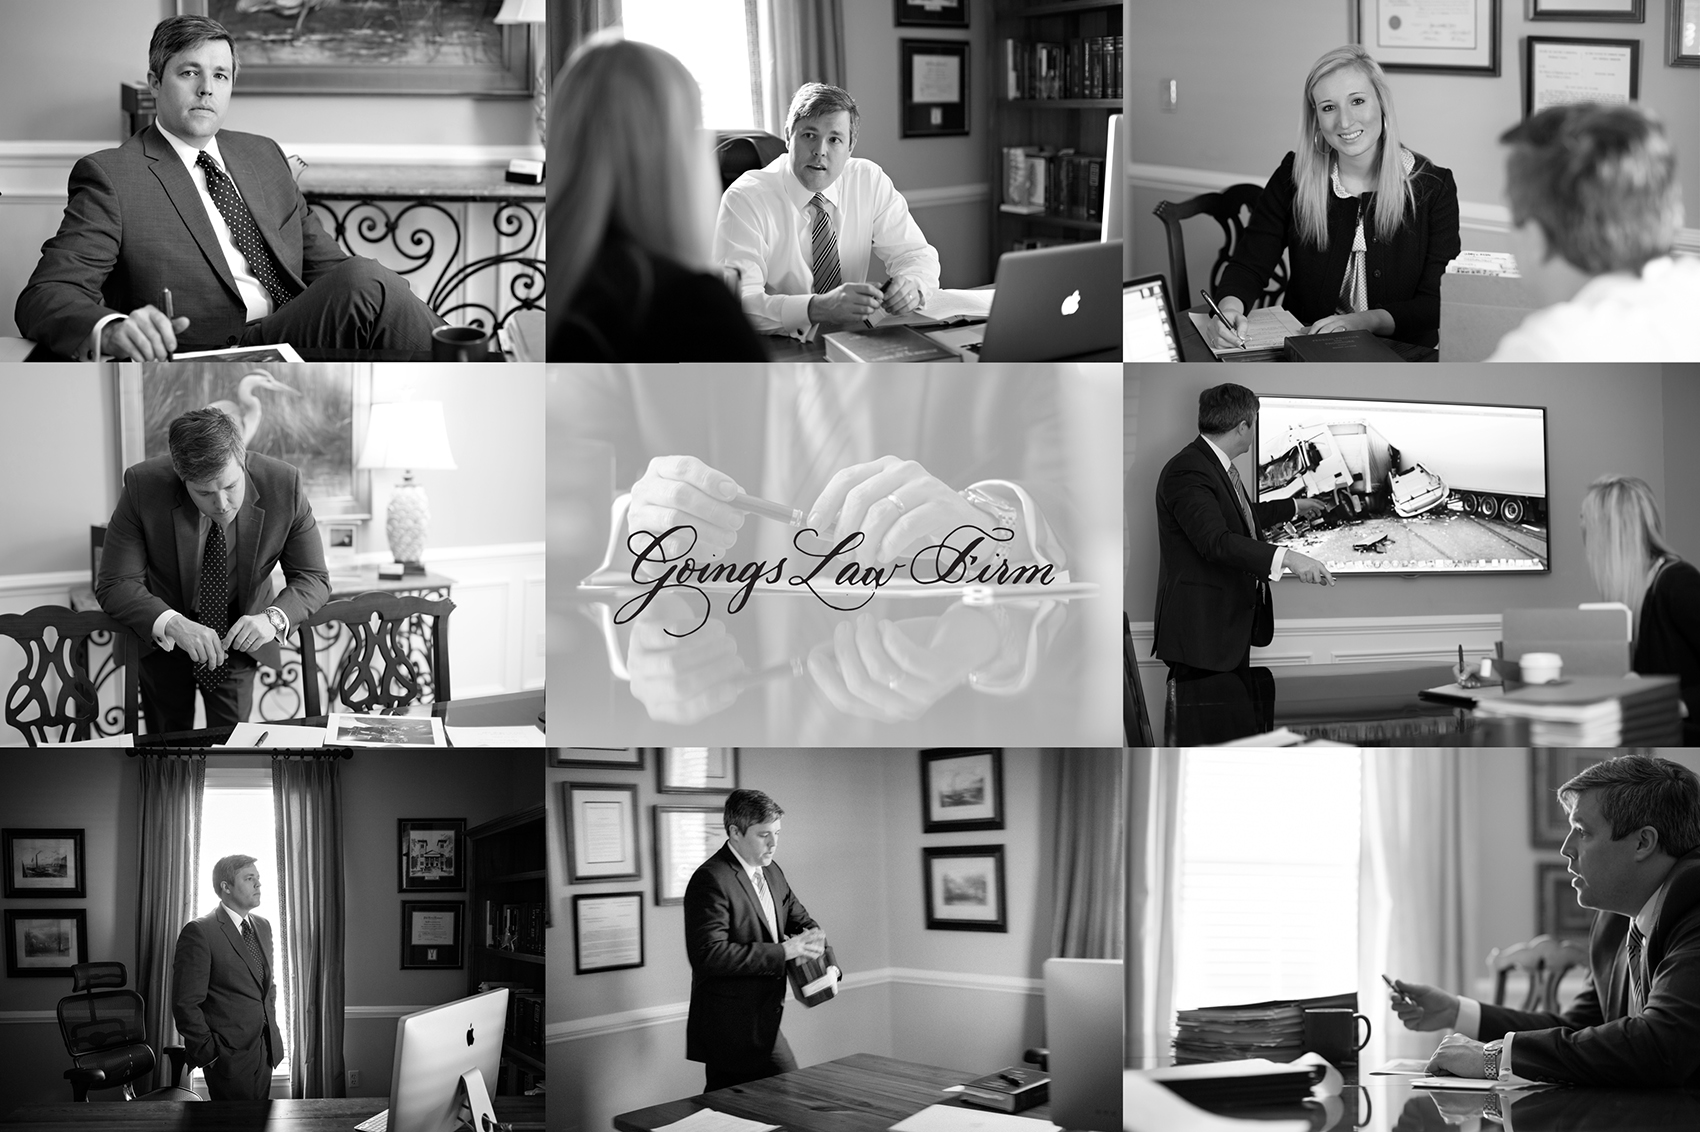 Goings Law Firm, LLC